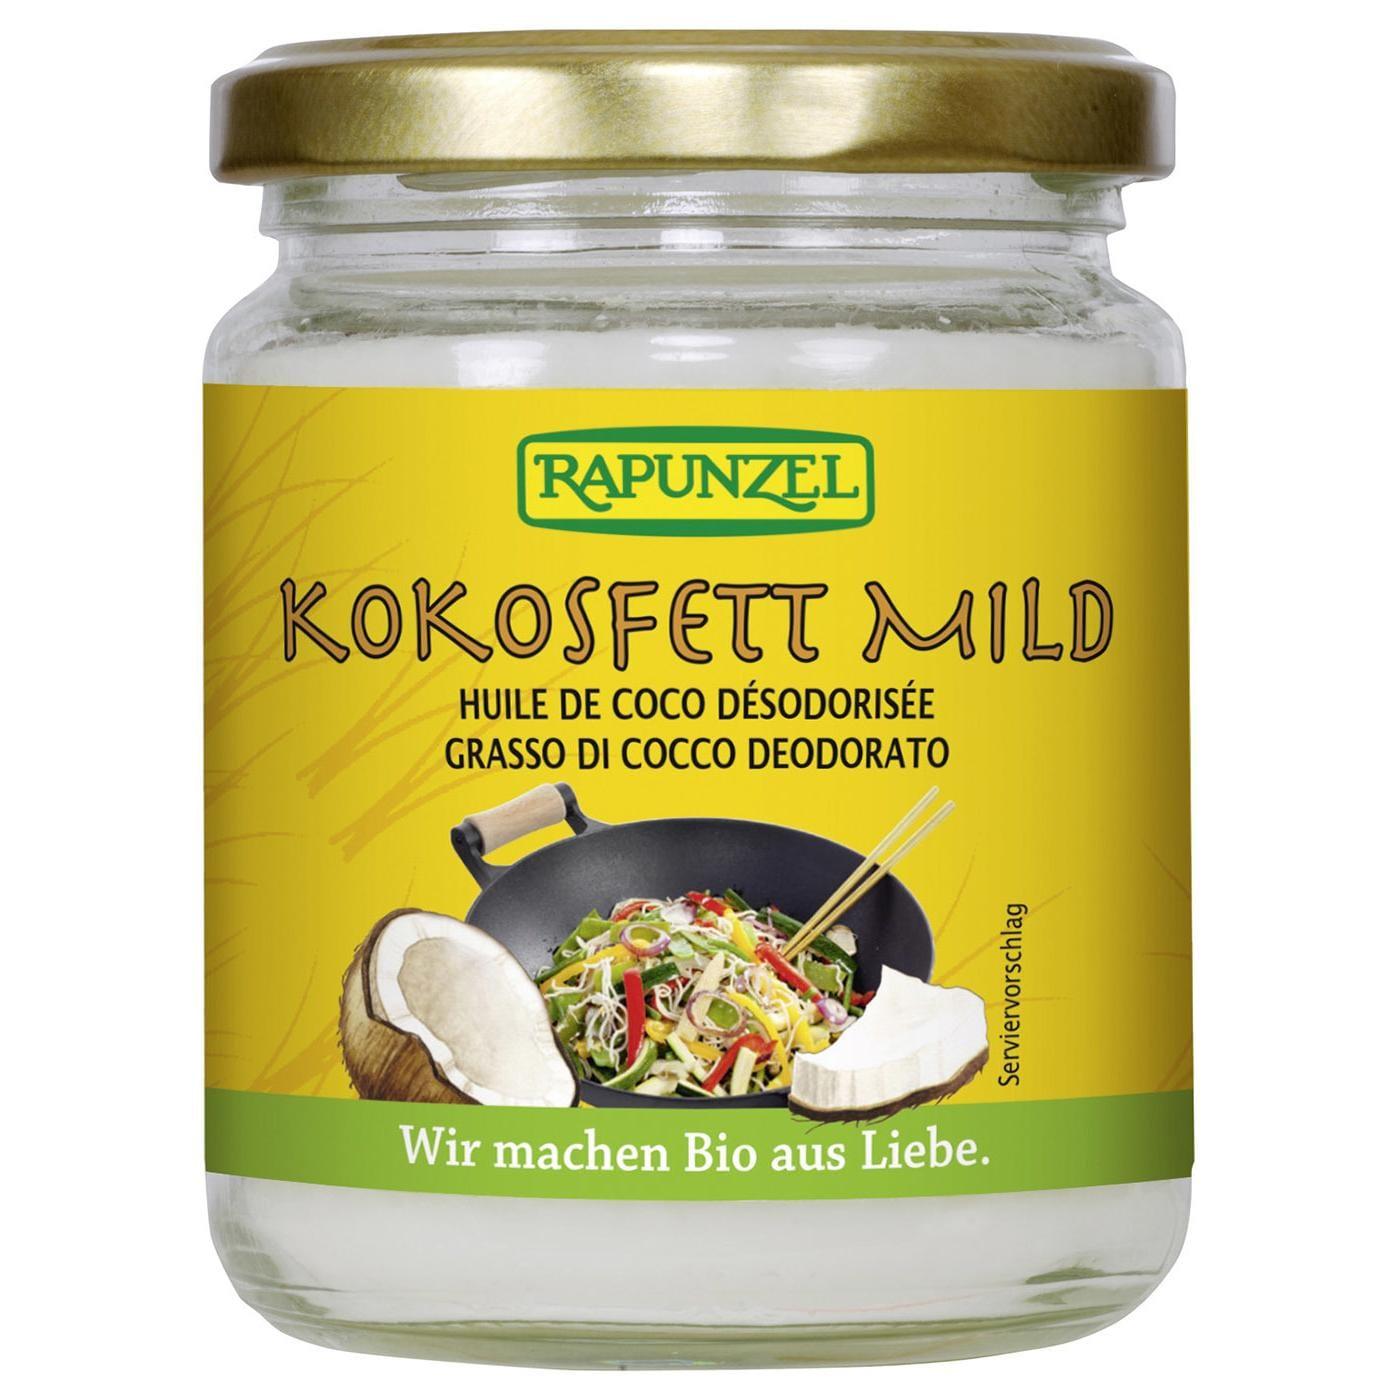 Rapunzel Bio Kokosfett mild 200g